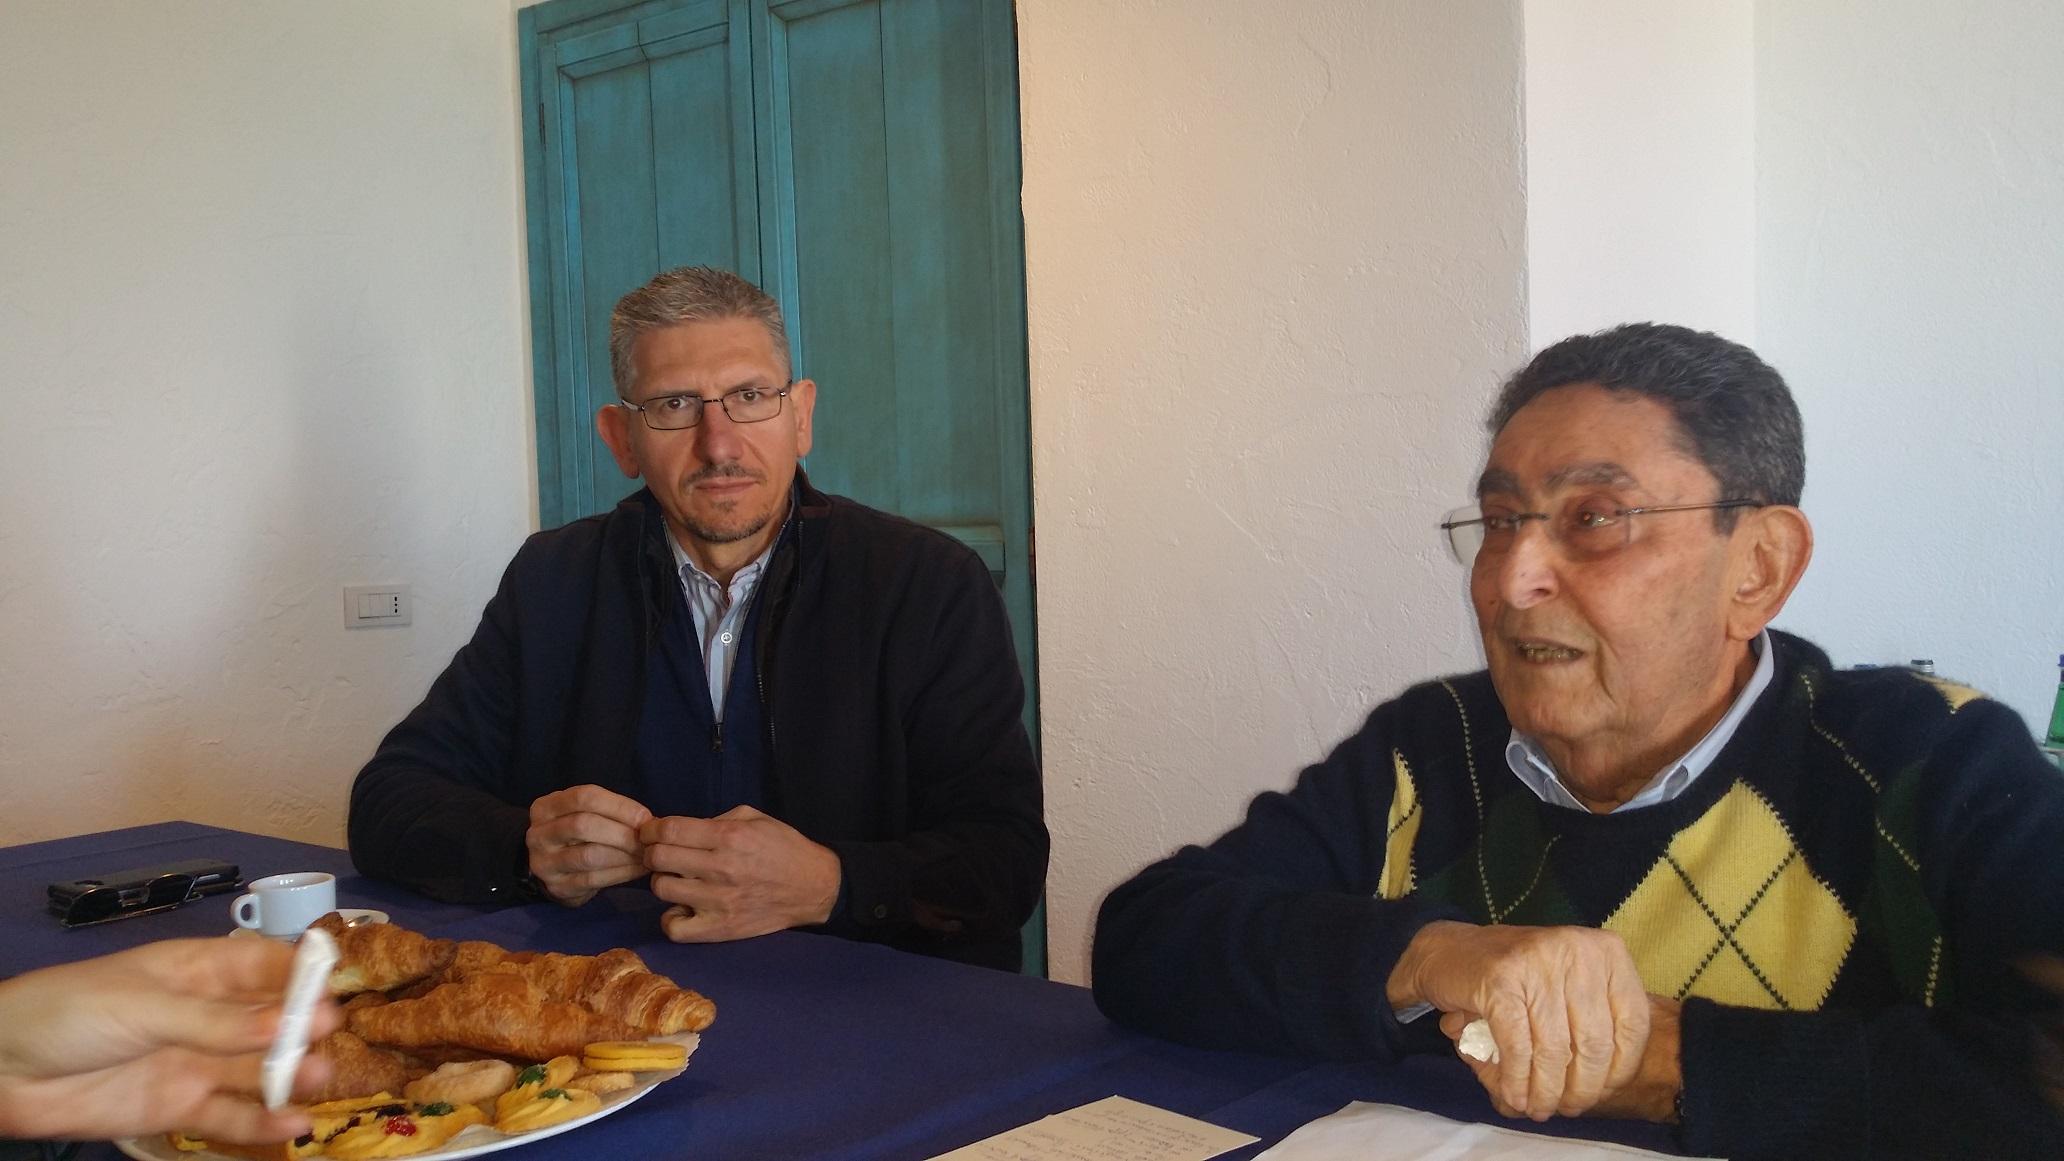 Amedeo Bianchi e Stefano Zappalà